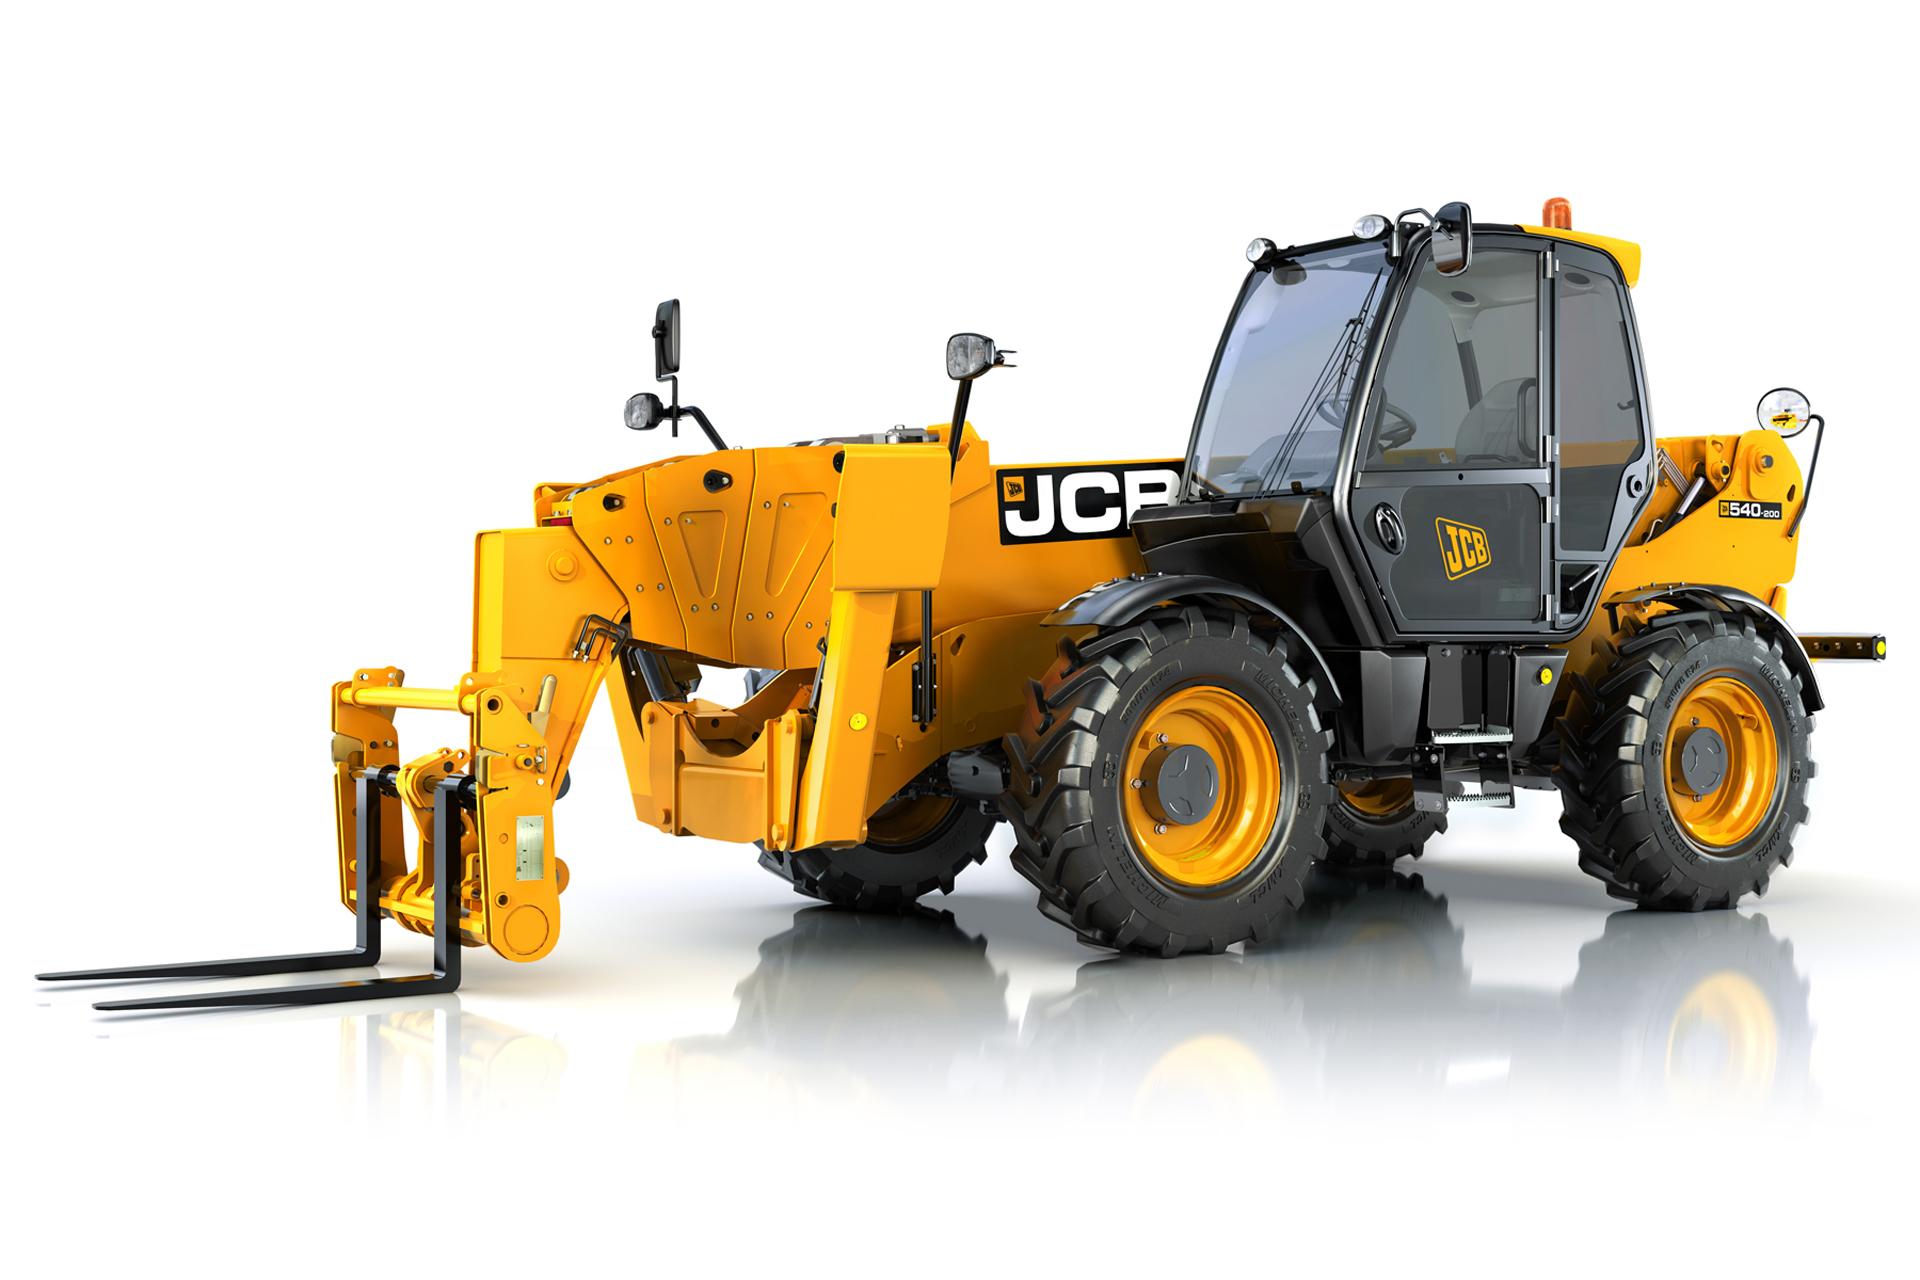 JCB 540 - 200 [74.2 KW]